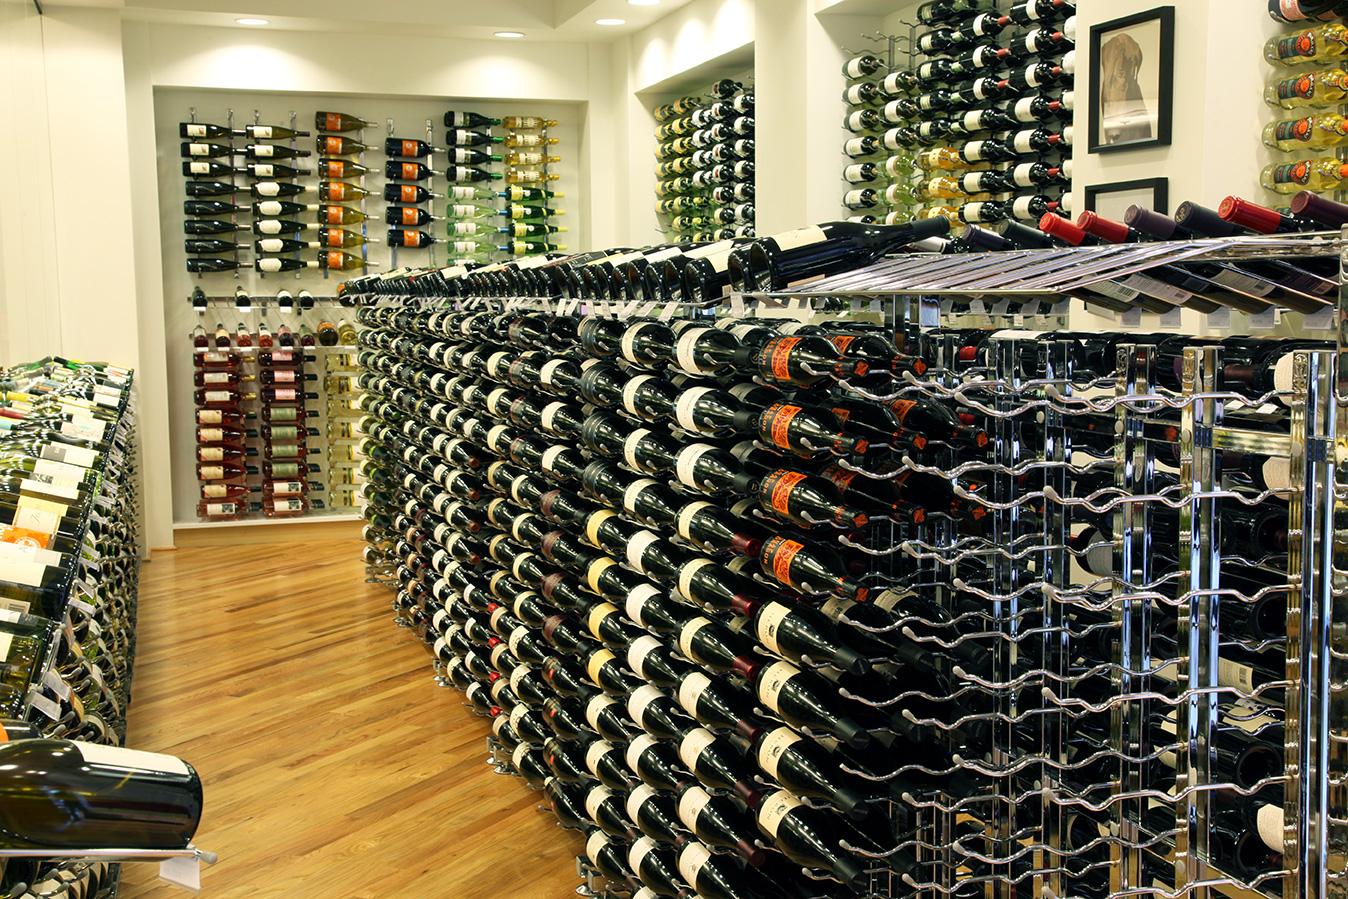 VintageView wine racks for commercial settings